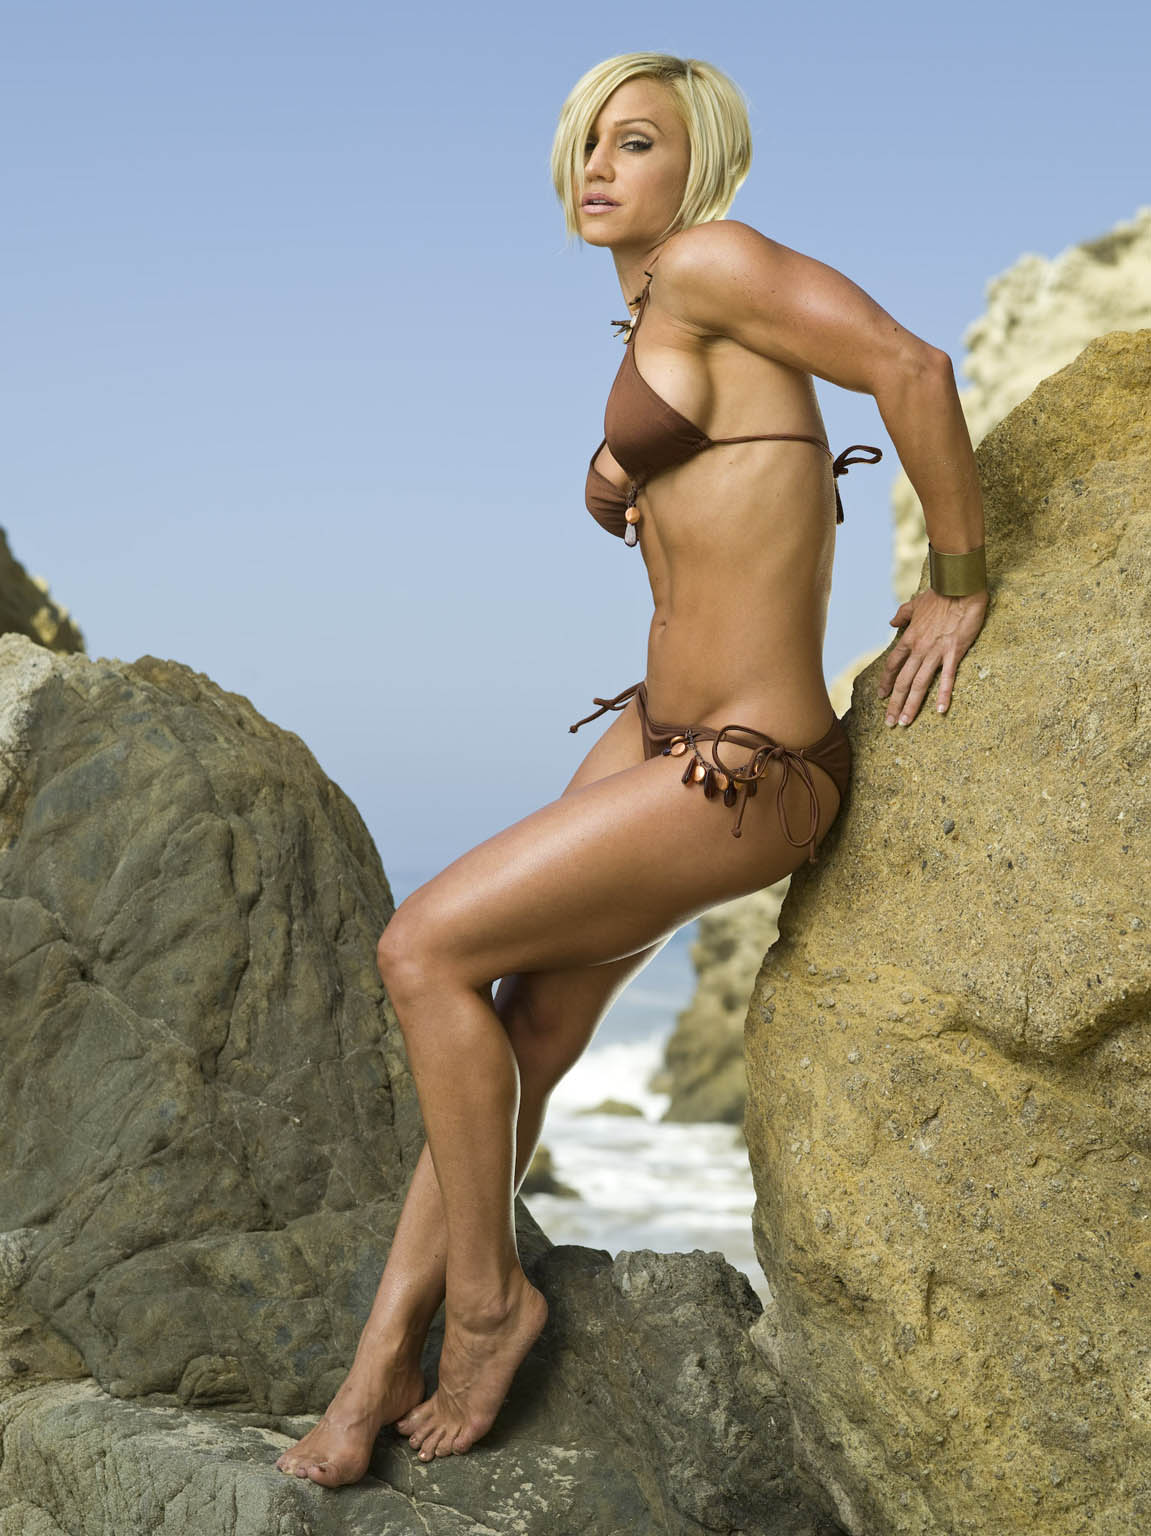 http://2.bp.blogspot.com/-gRxirbLXPWM/TaFjbHAOidI/AAAAAAAAUV8/JDTuQhFMn5w/s1600/Jamie+Eason-American+Fitness+Model-3.jpg